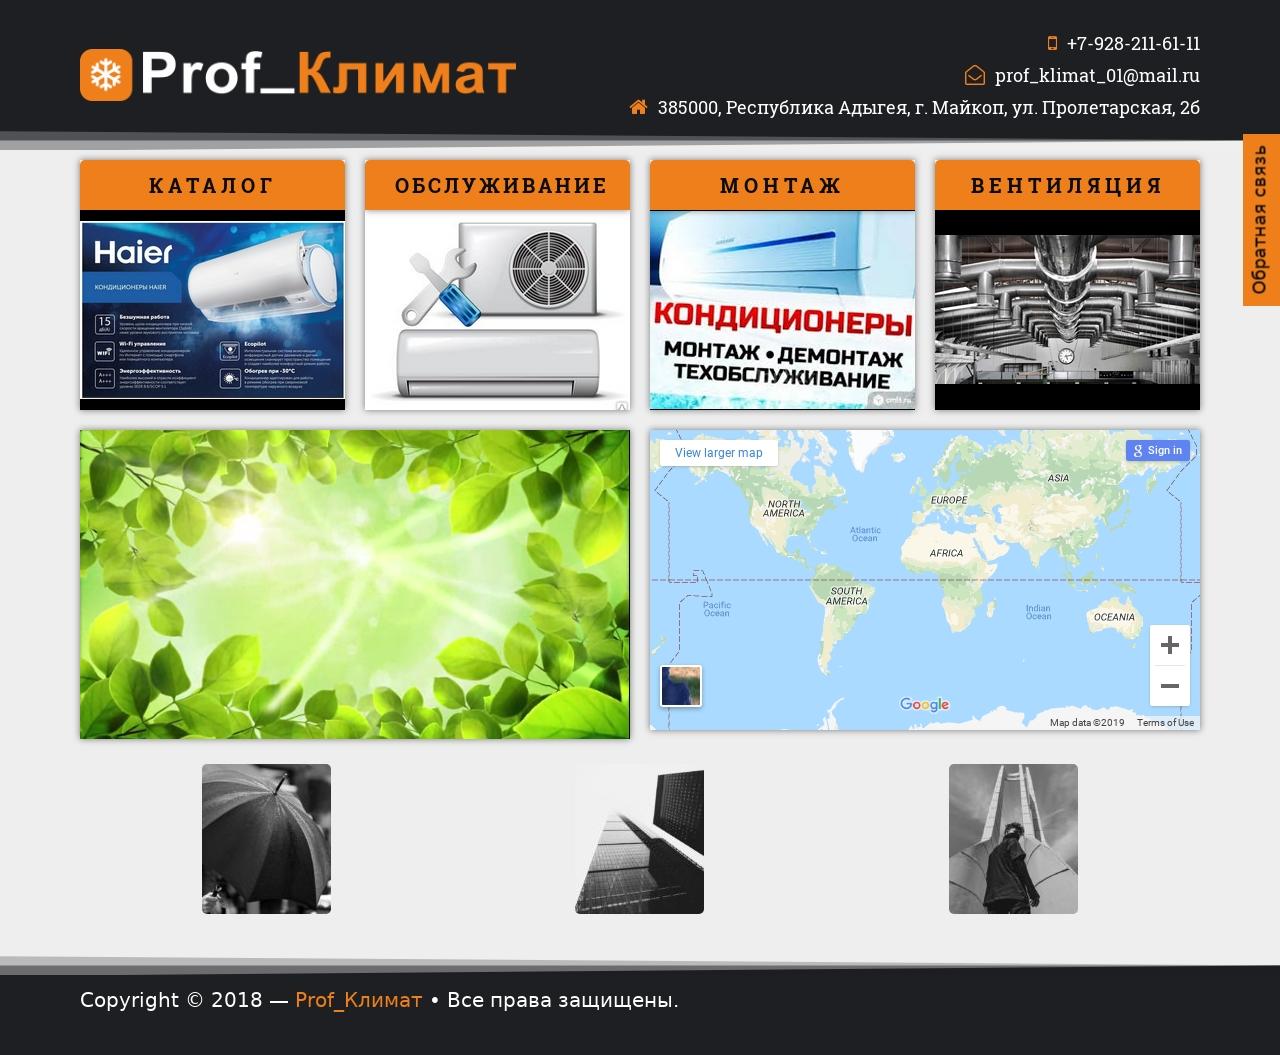 Prof_Климат